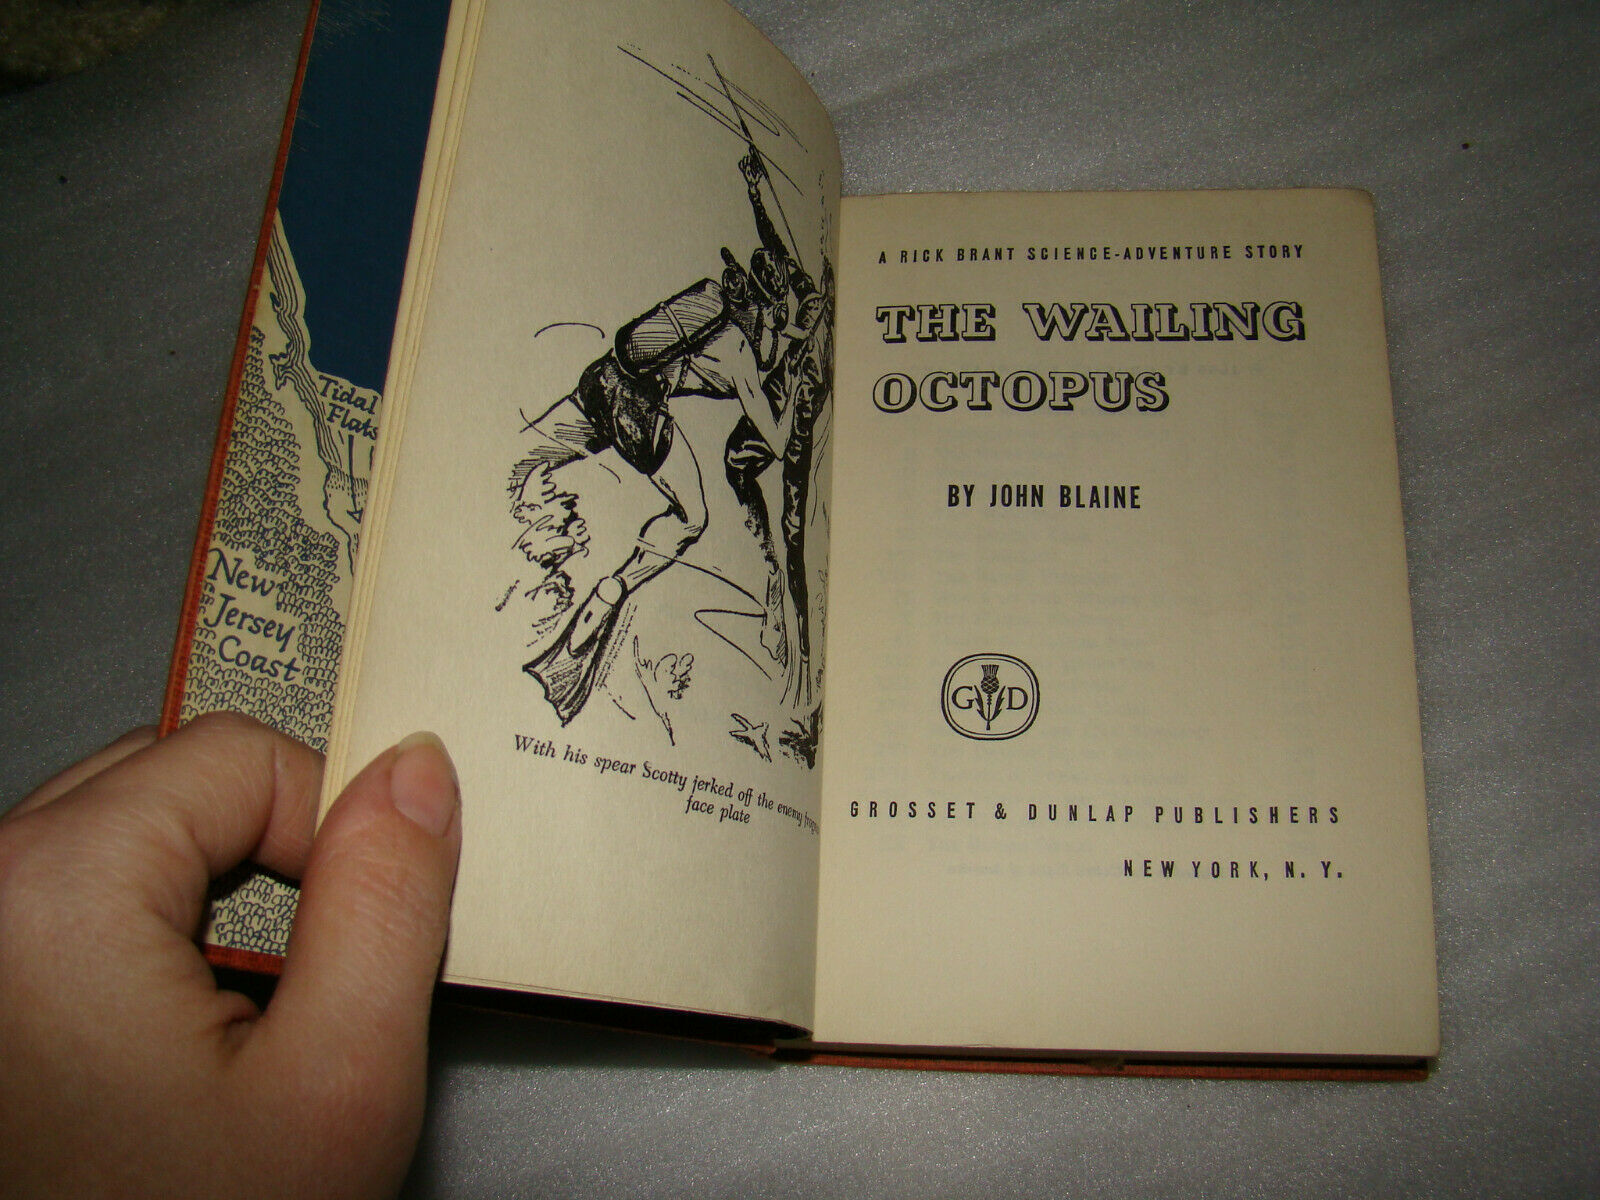 Vtg 1956 THE WAILING OCTOPUS Rick Brant Electornic Adventure John Blaine HC Book